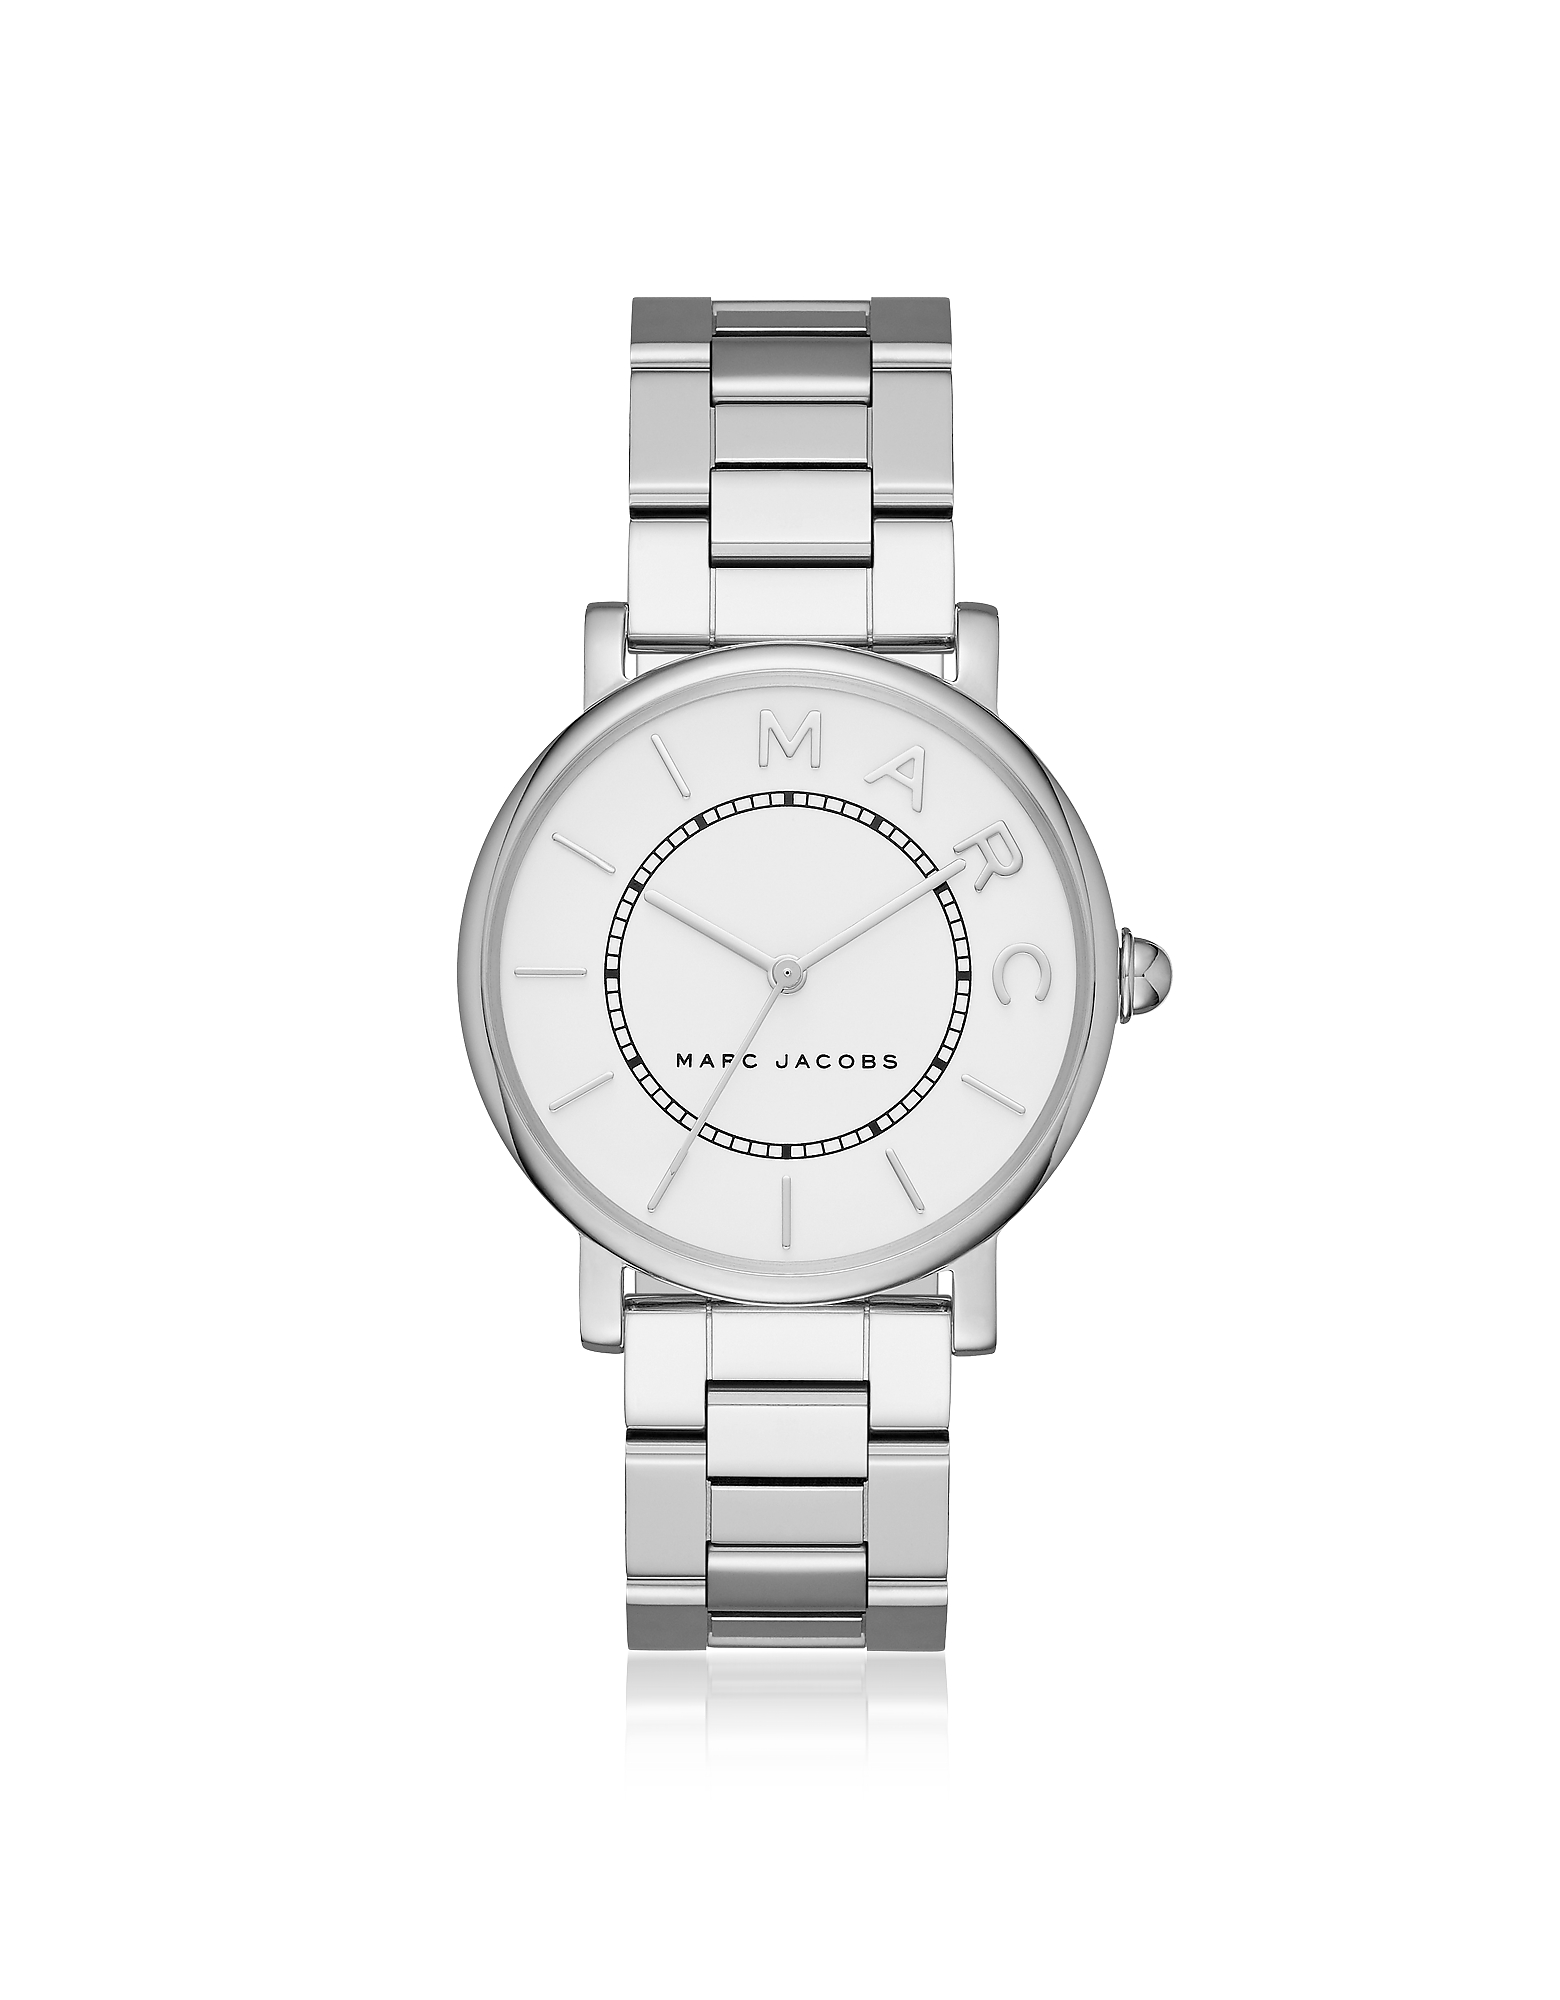 Marc Jacobs Women's Watches, Roxy Silver Tone Women's Watch